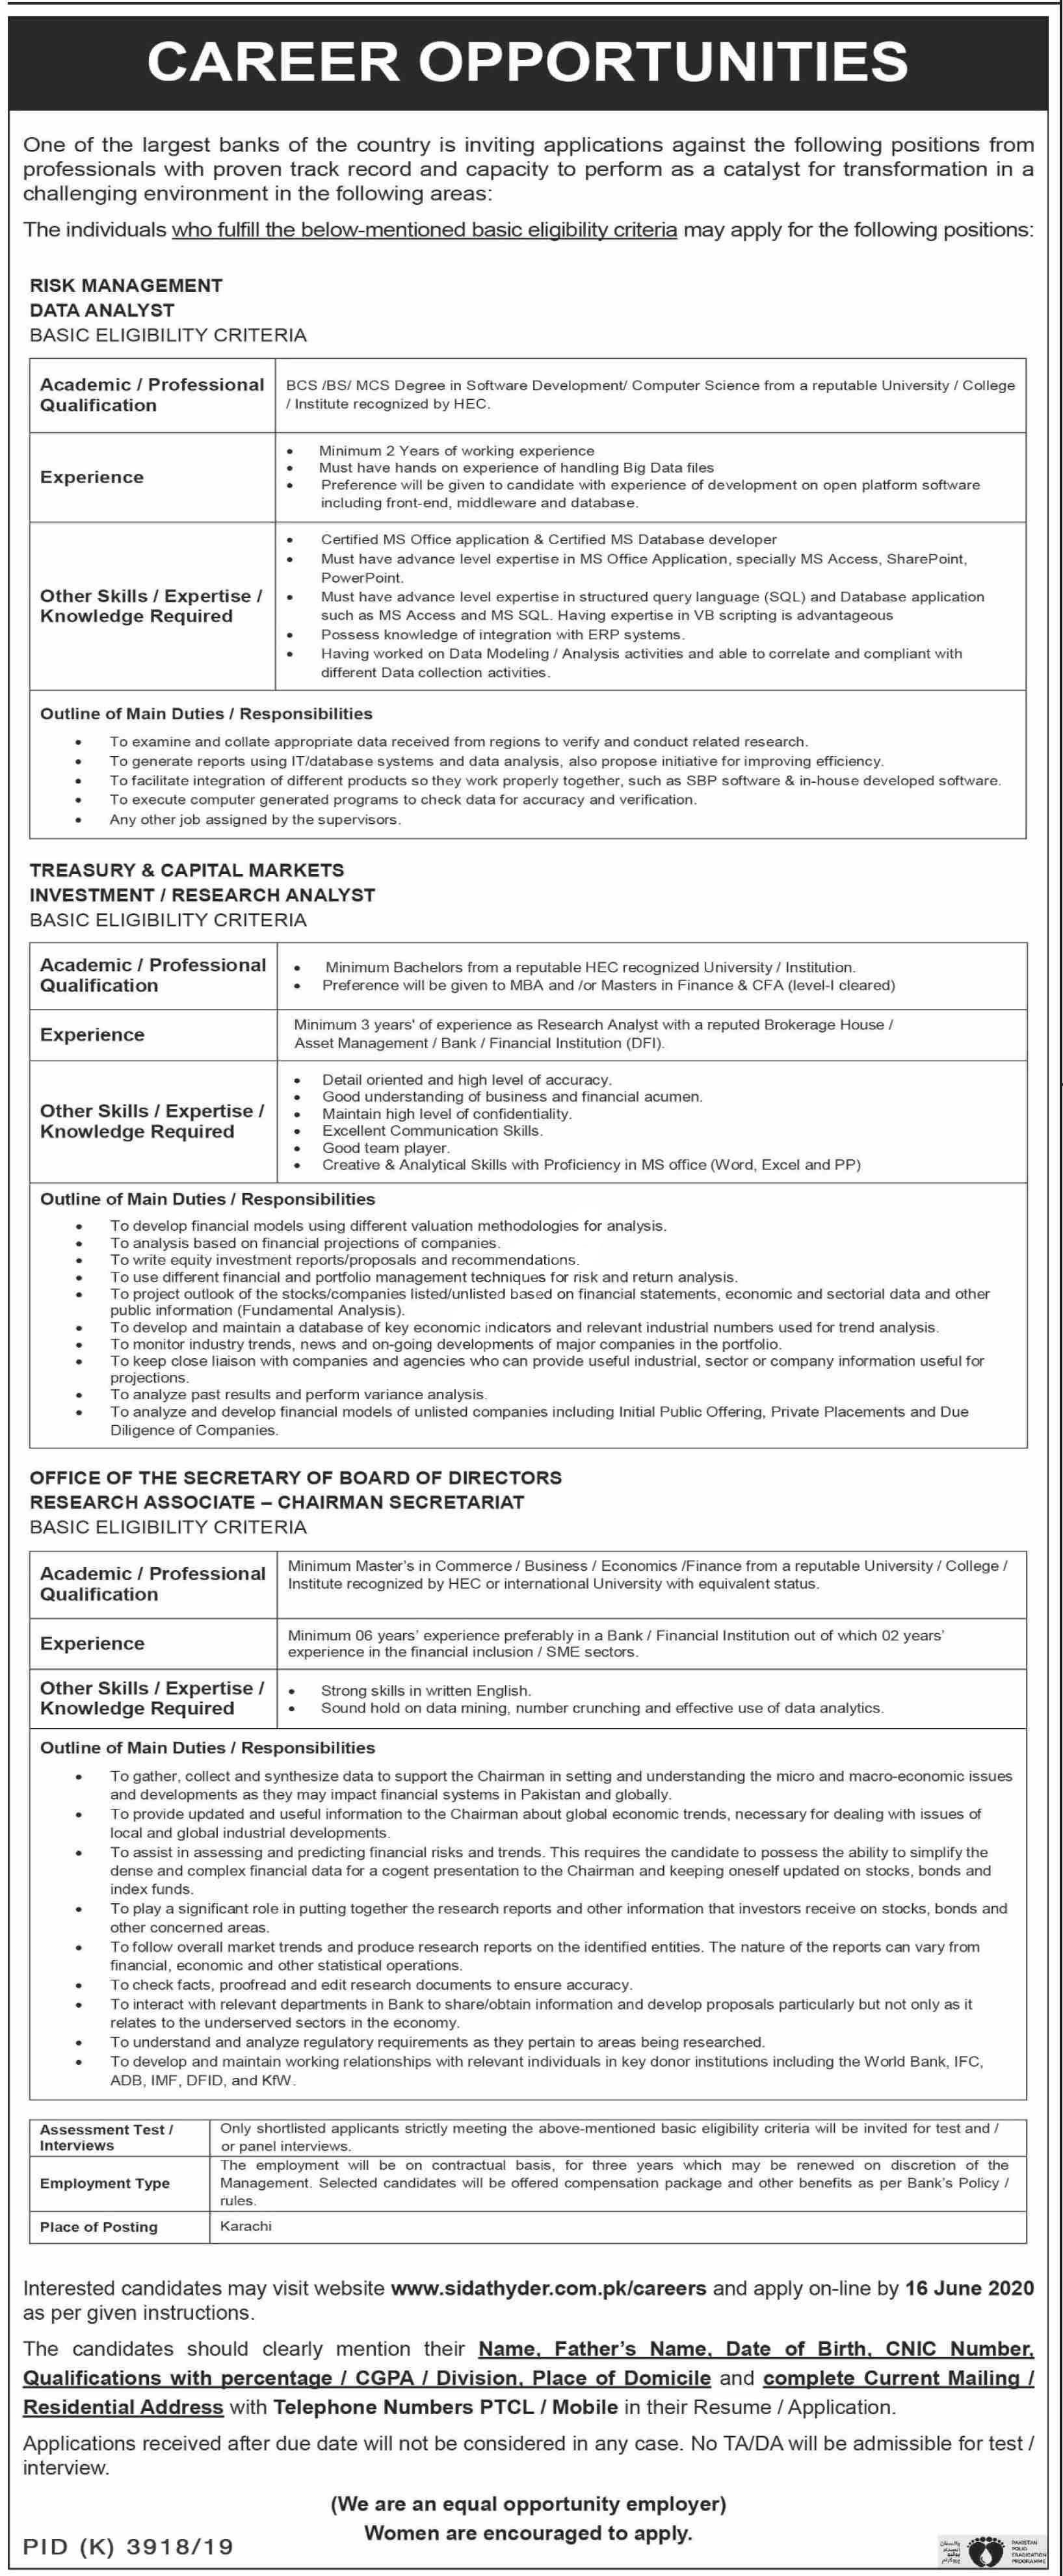 Sidat Hyder Morshed Associates Pvt Ltd Karachi Jobs 2020